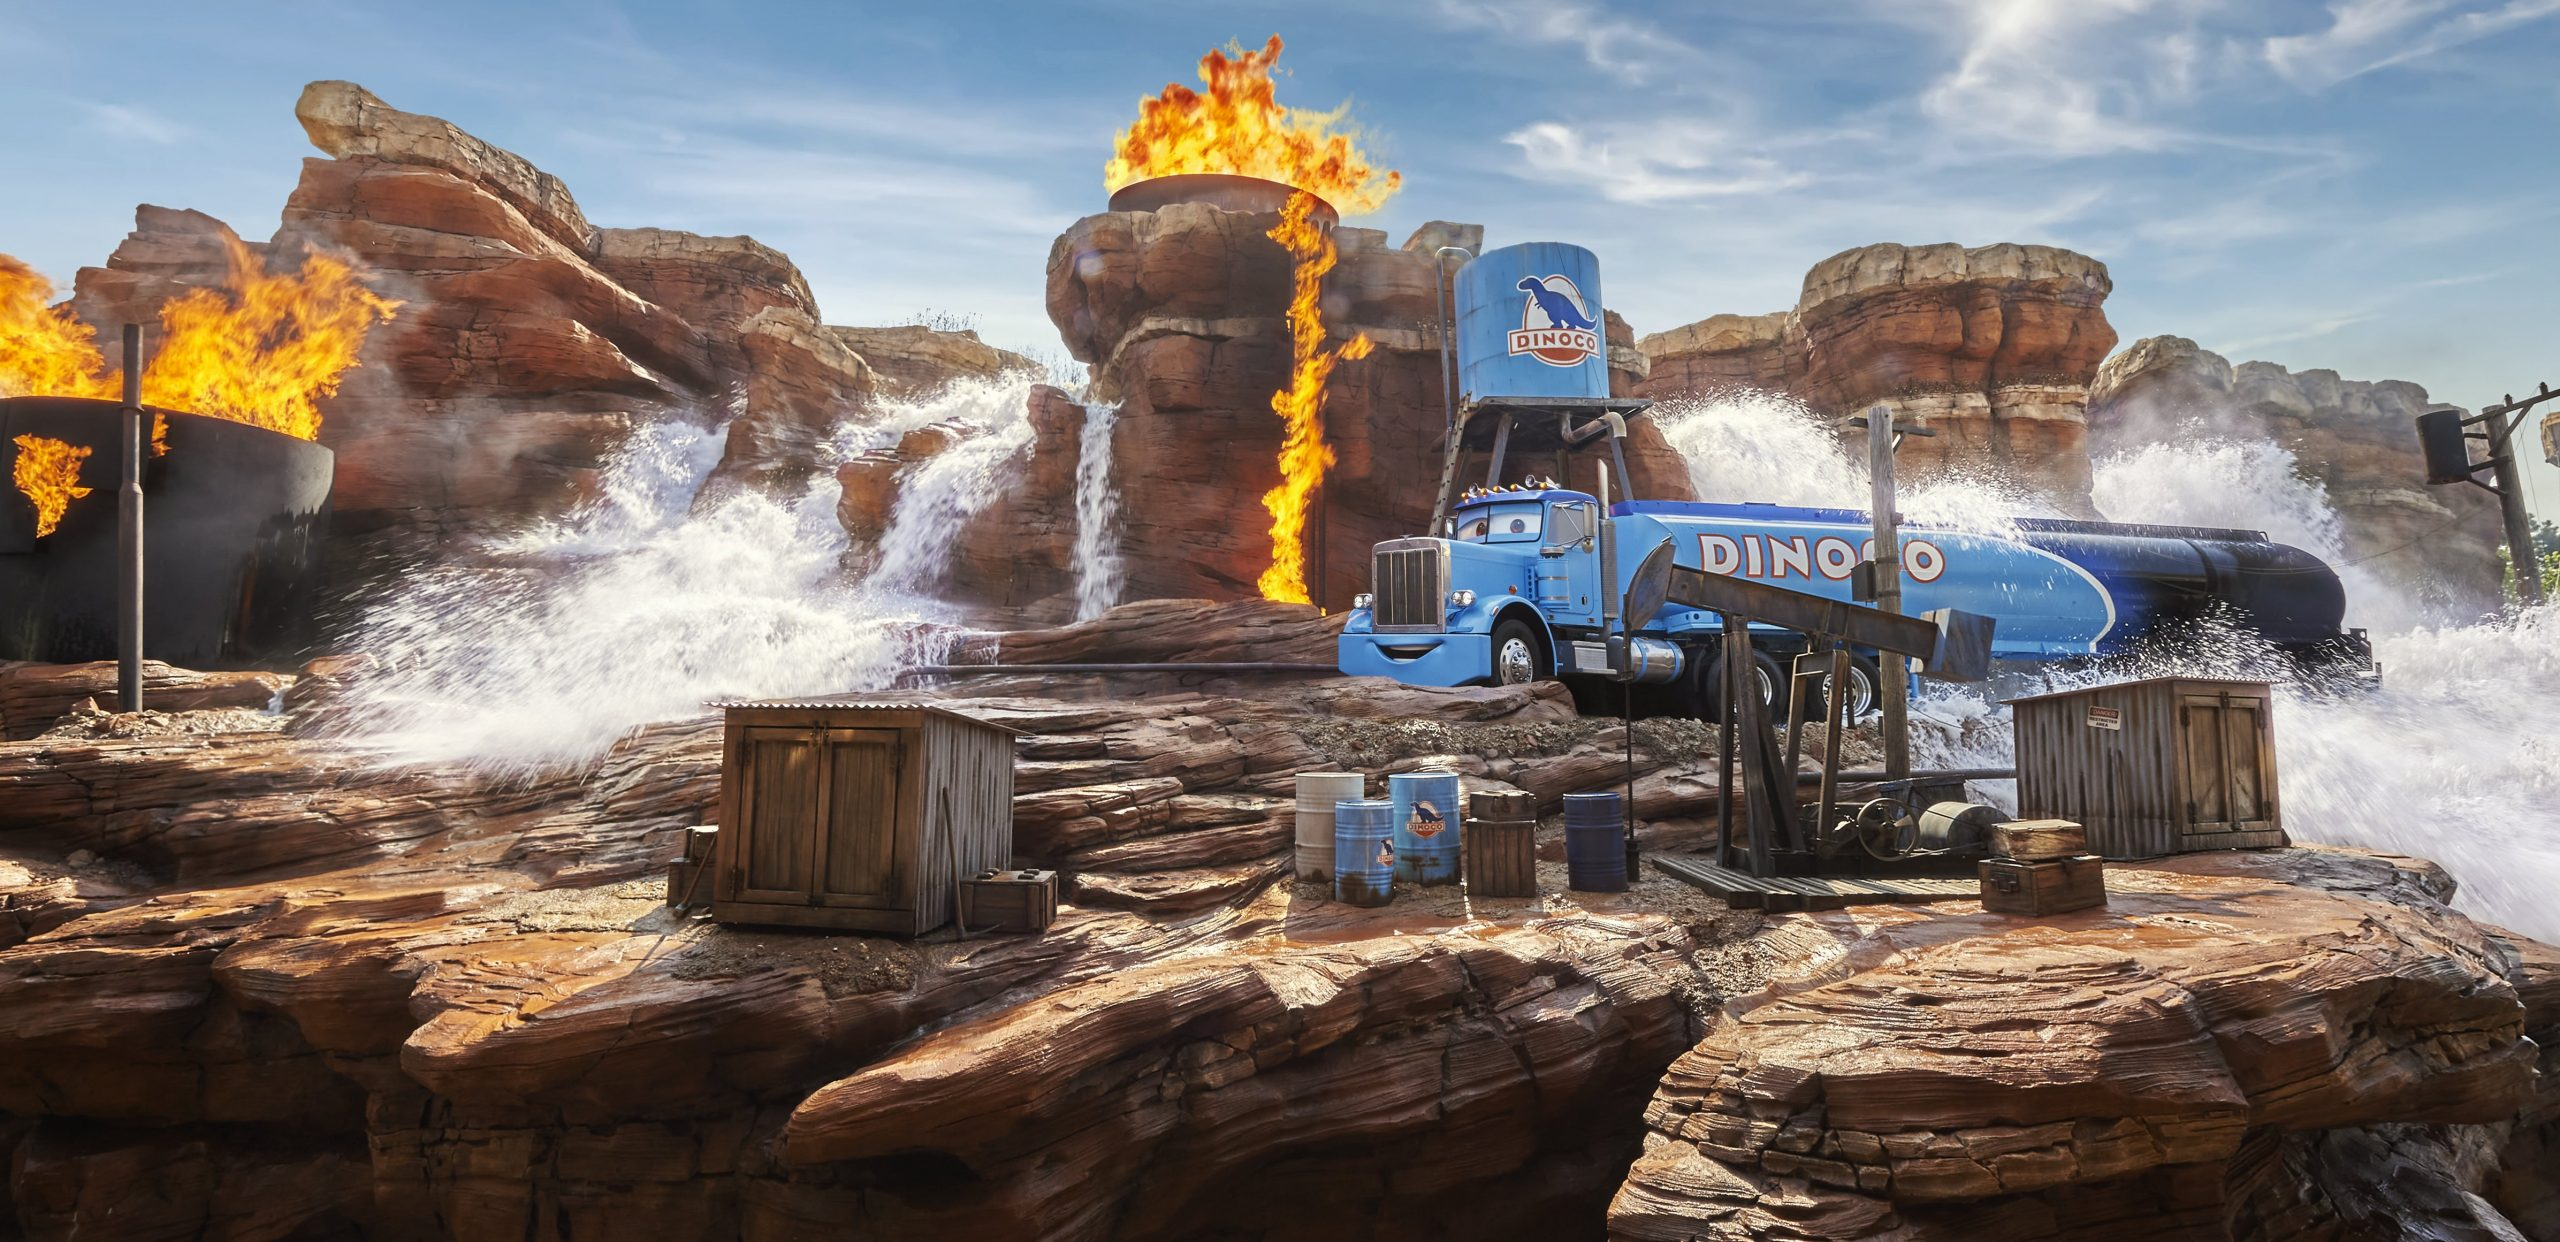 photos cars road trip disneyland paris nouvelle attraction disneyland 2021